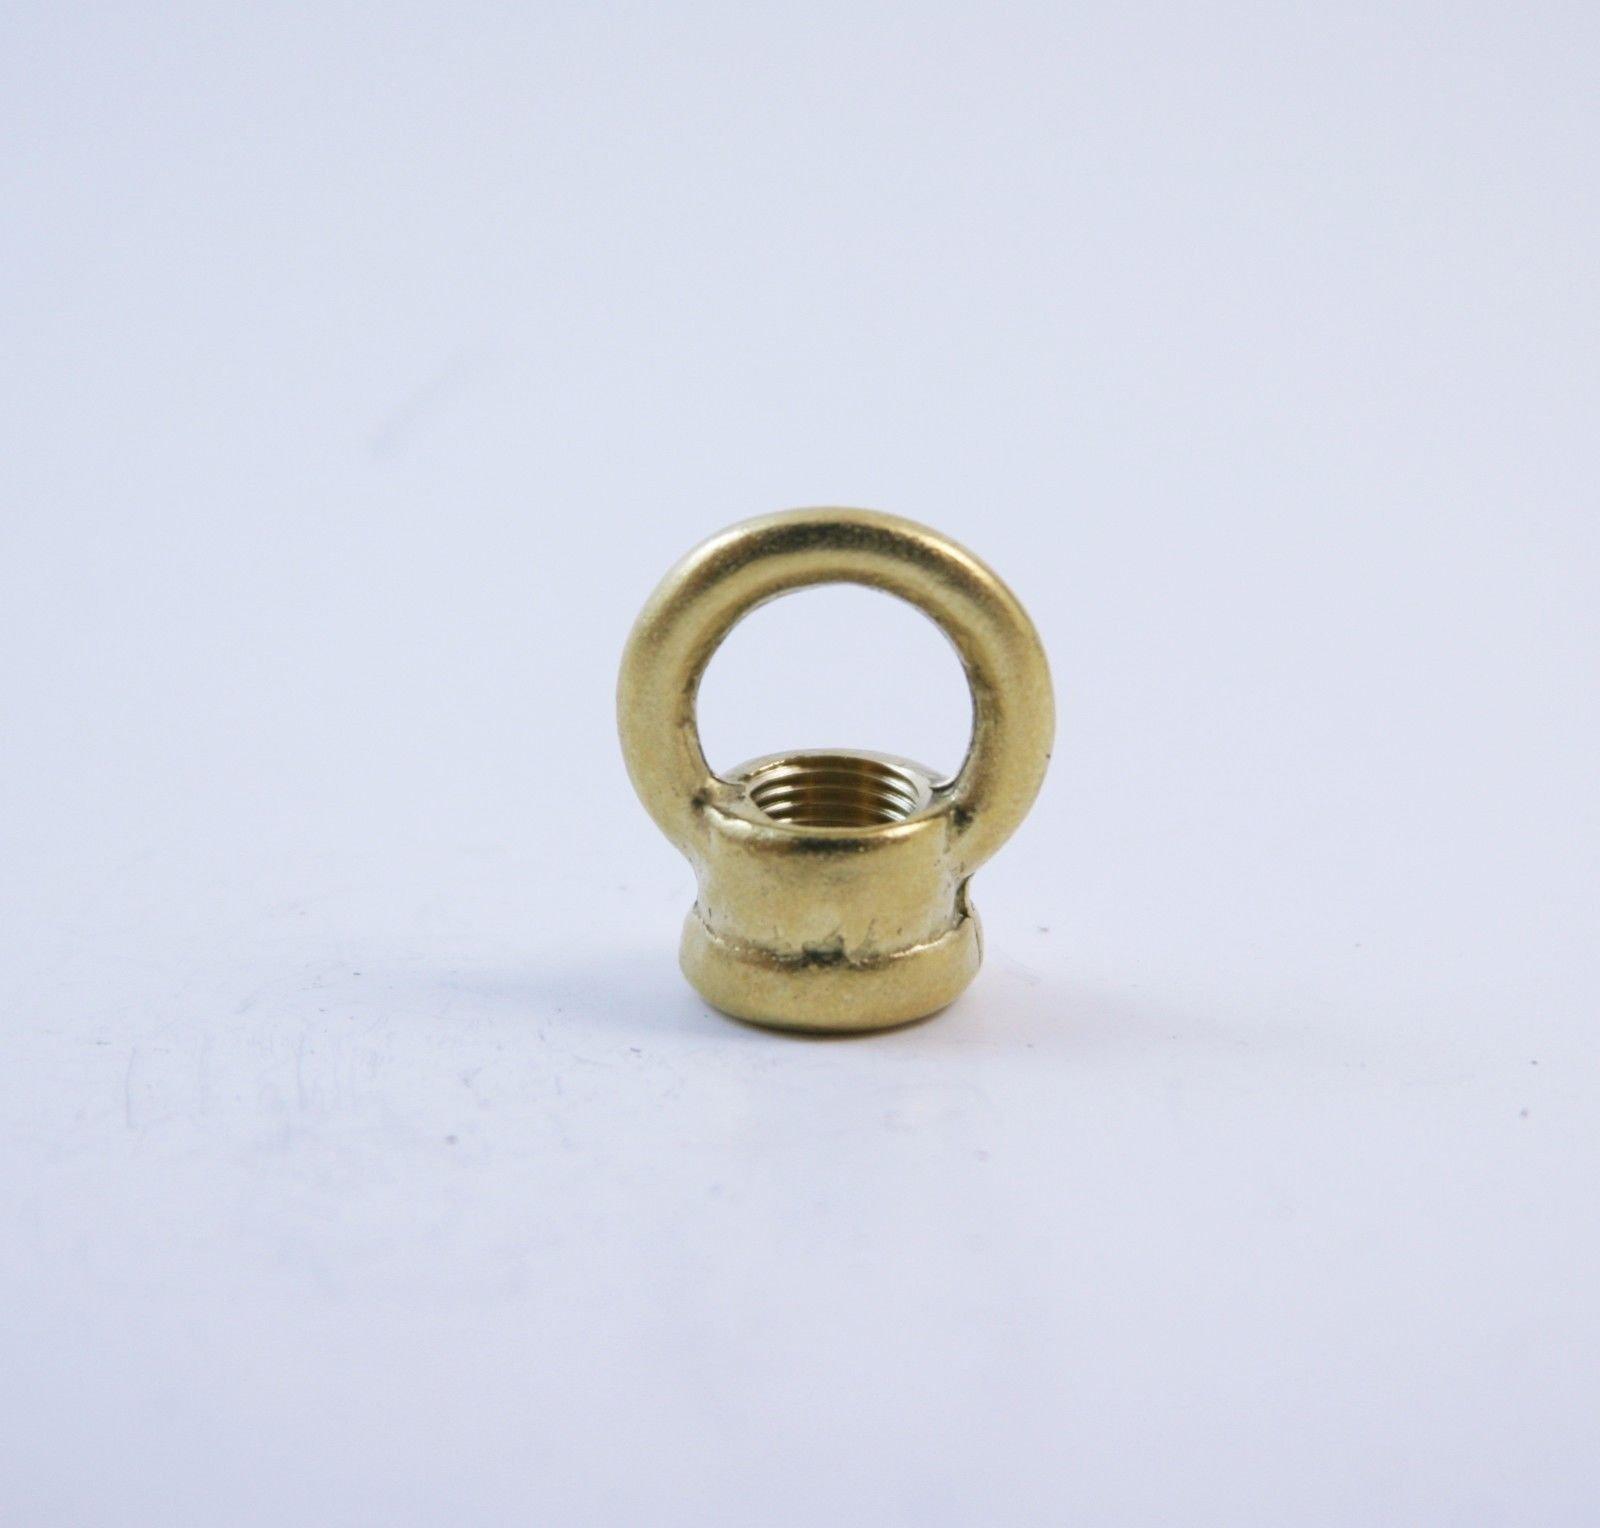 "Orange design 2 Pcs Unfinished Solid Brass Loop W Wire-way 3/8"" Female Thread For Chandelier"